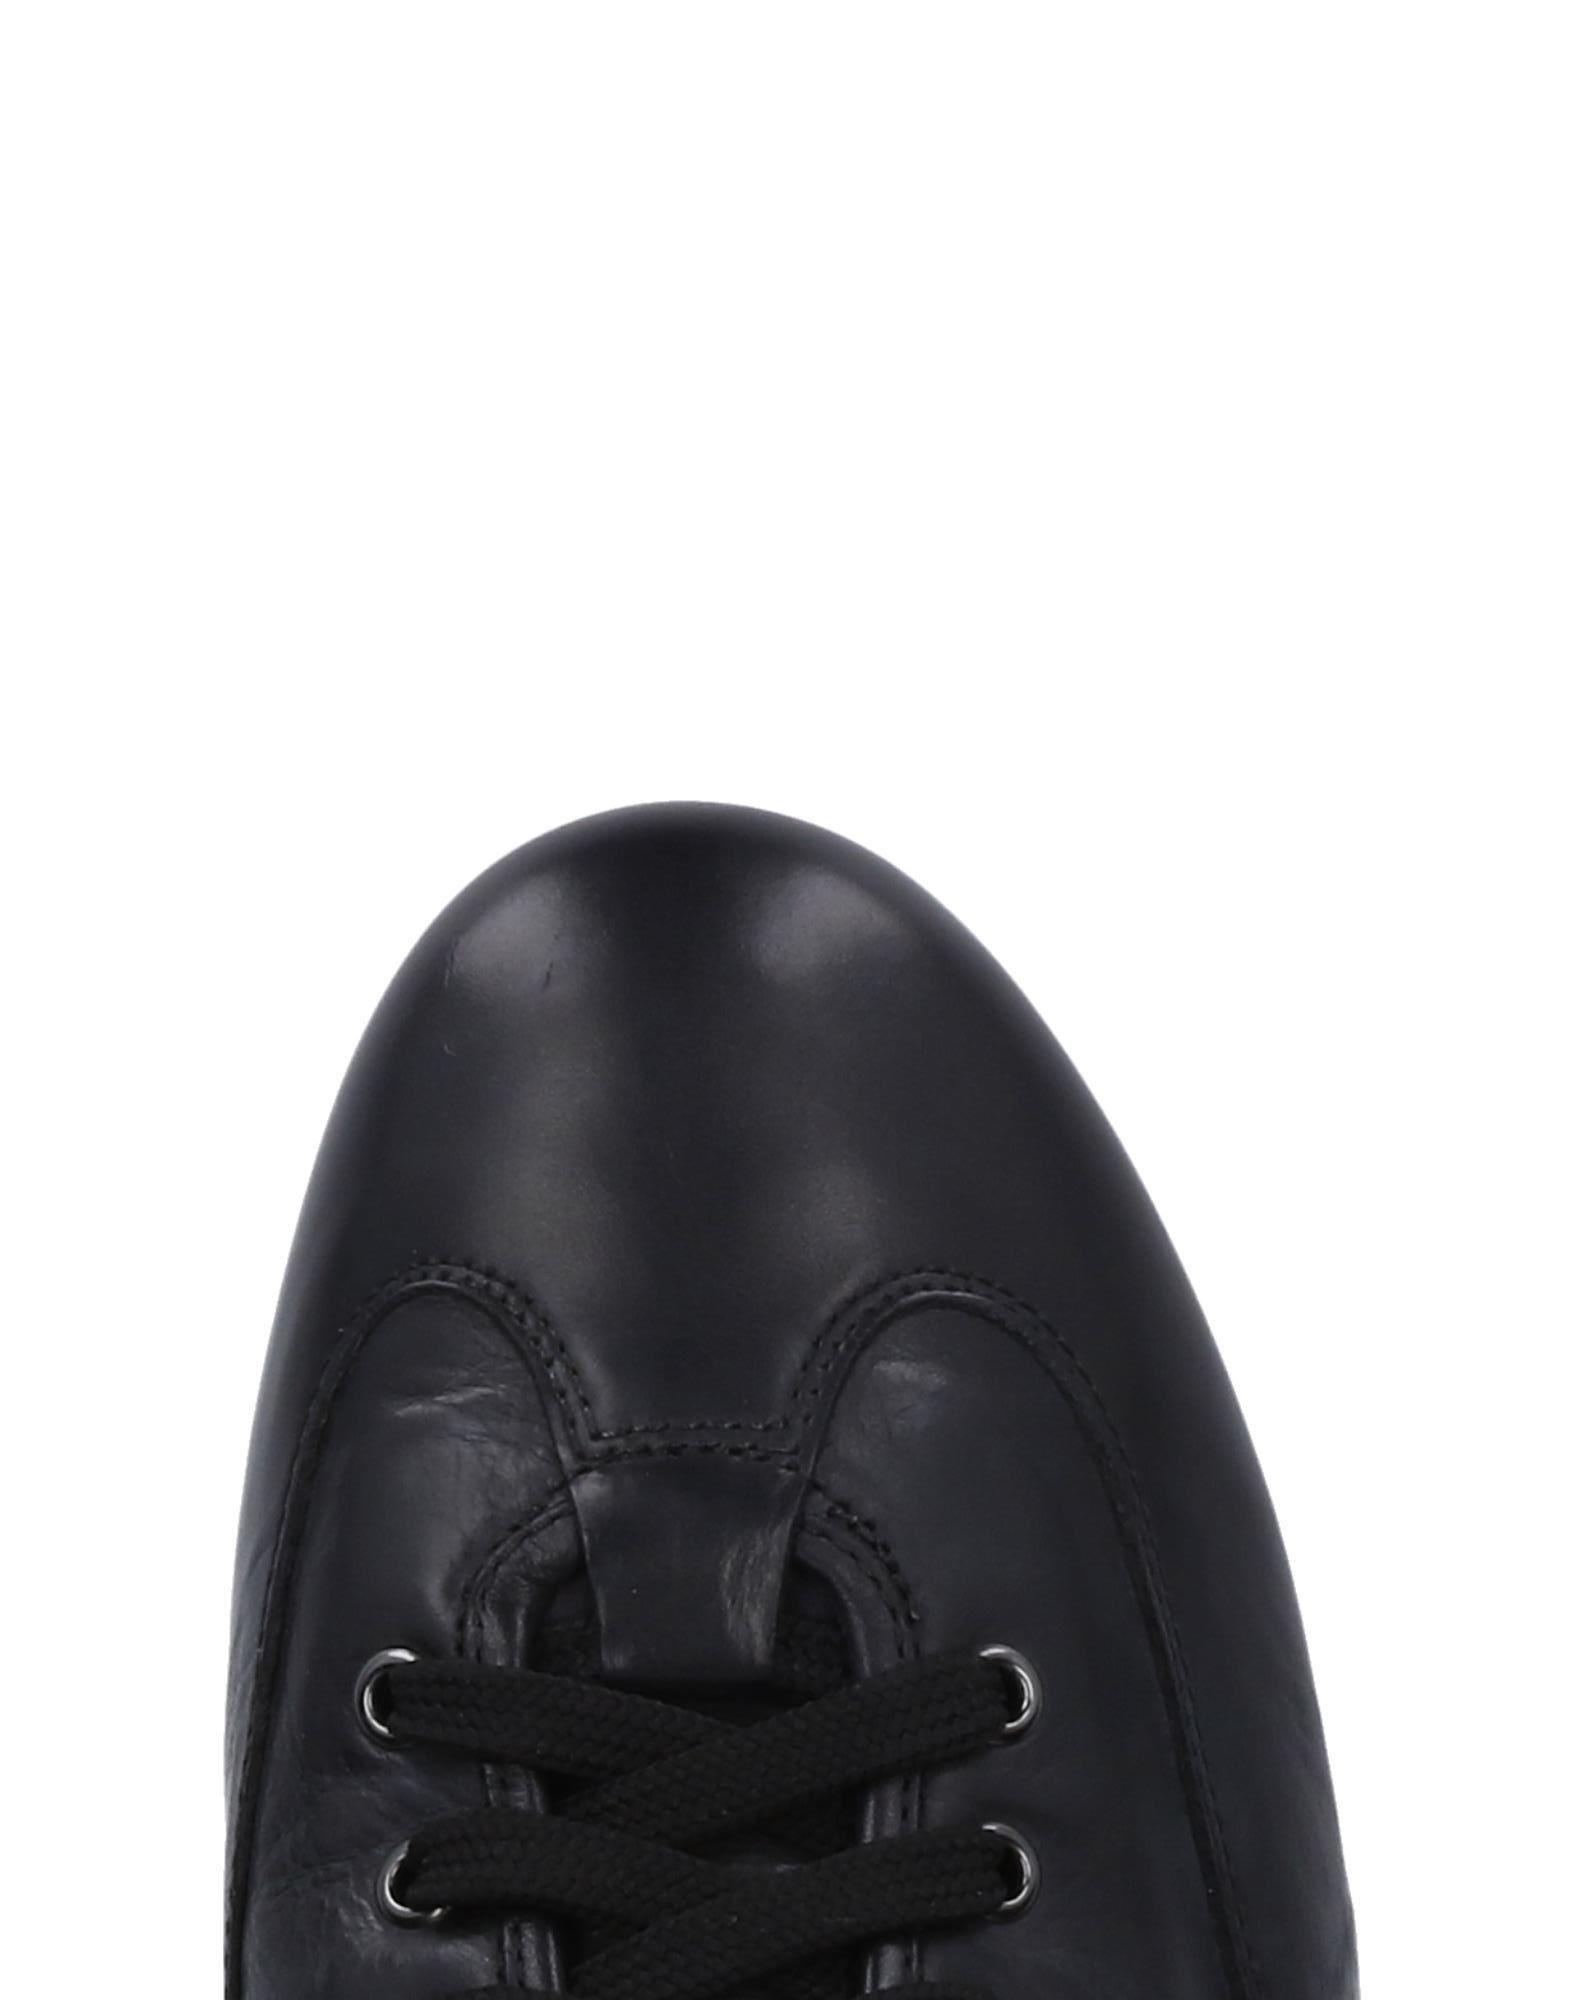 Alberto Guardiani Gute Sneakers Herren  11501739WR Gute Guardiani Qualität beliebte Schuhe 8e7df5